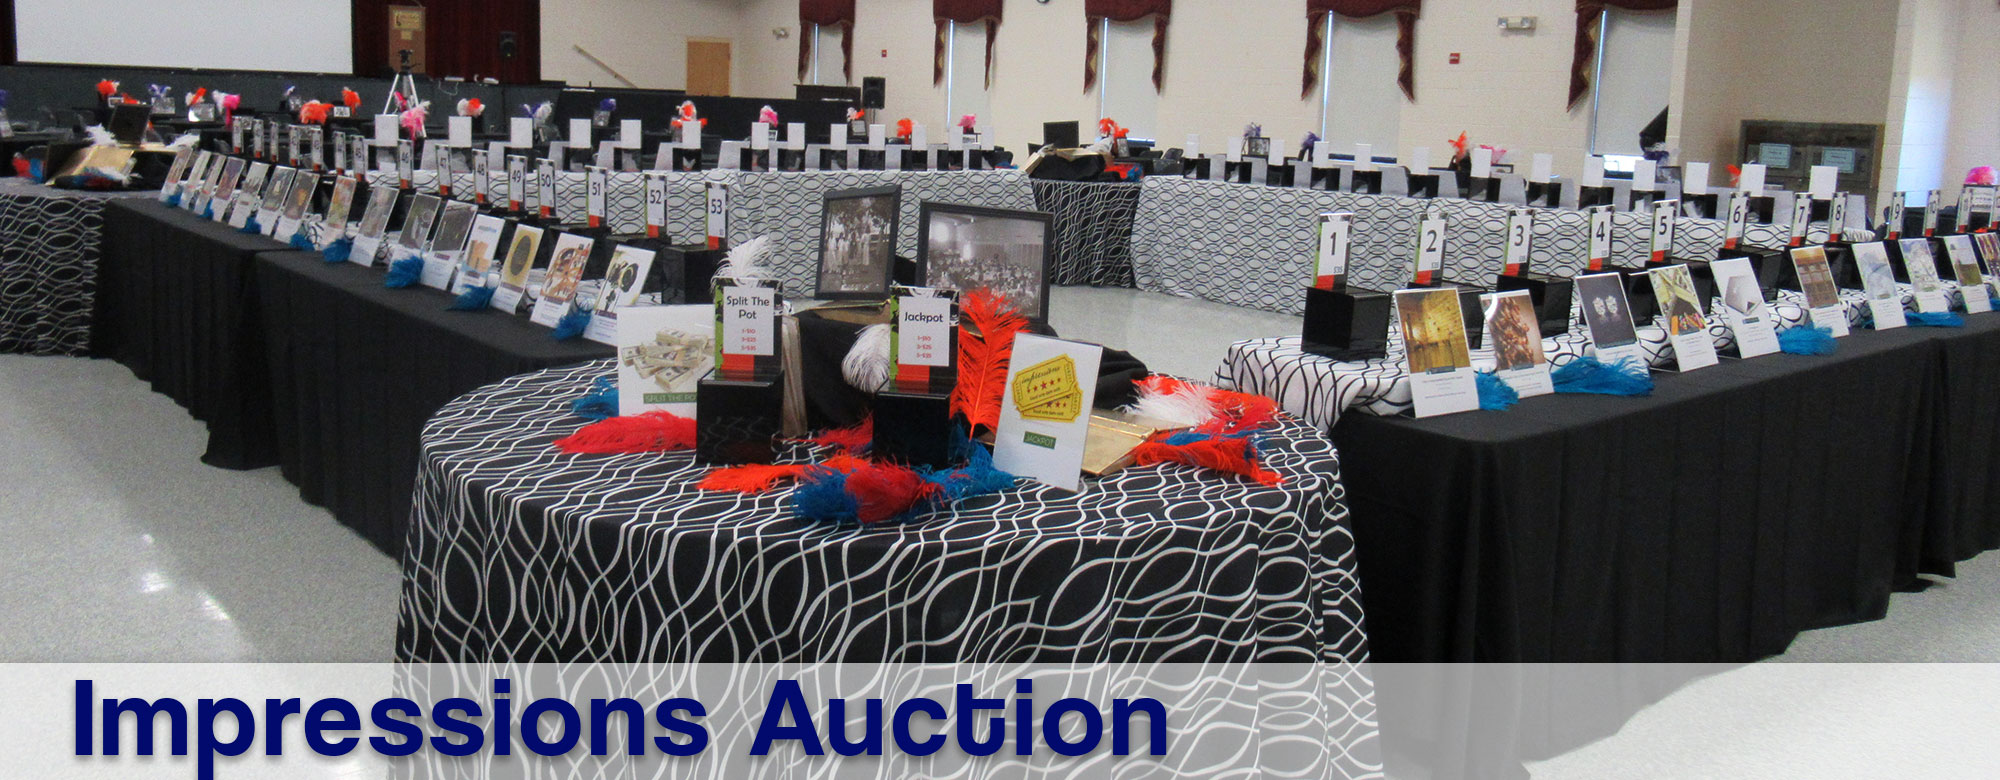 impressions-auction